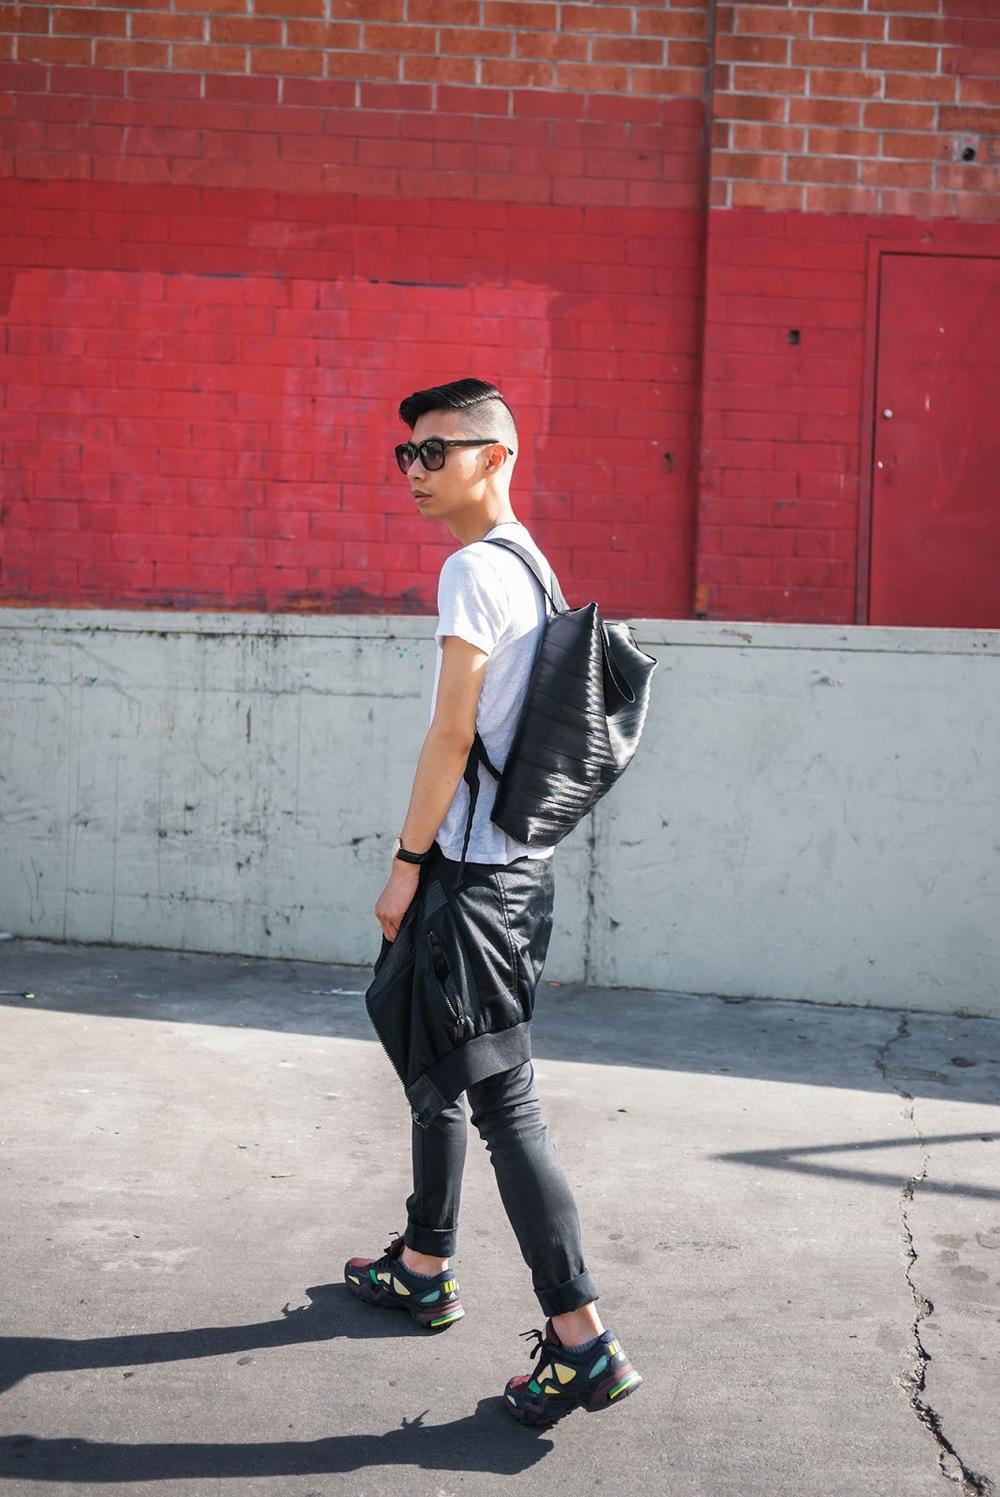 mybelonging-tommylei-menswearblogger-streetstyle-kaopaoshu-adidas-rafsimons-warbyparker-11-copy.jpg